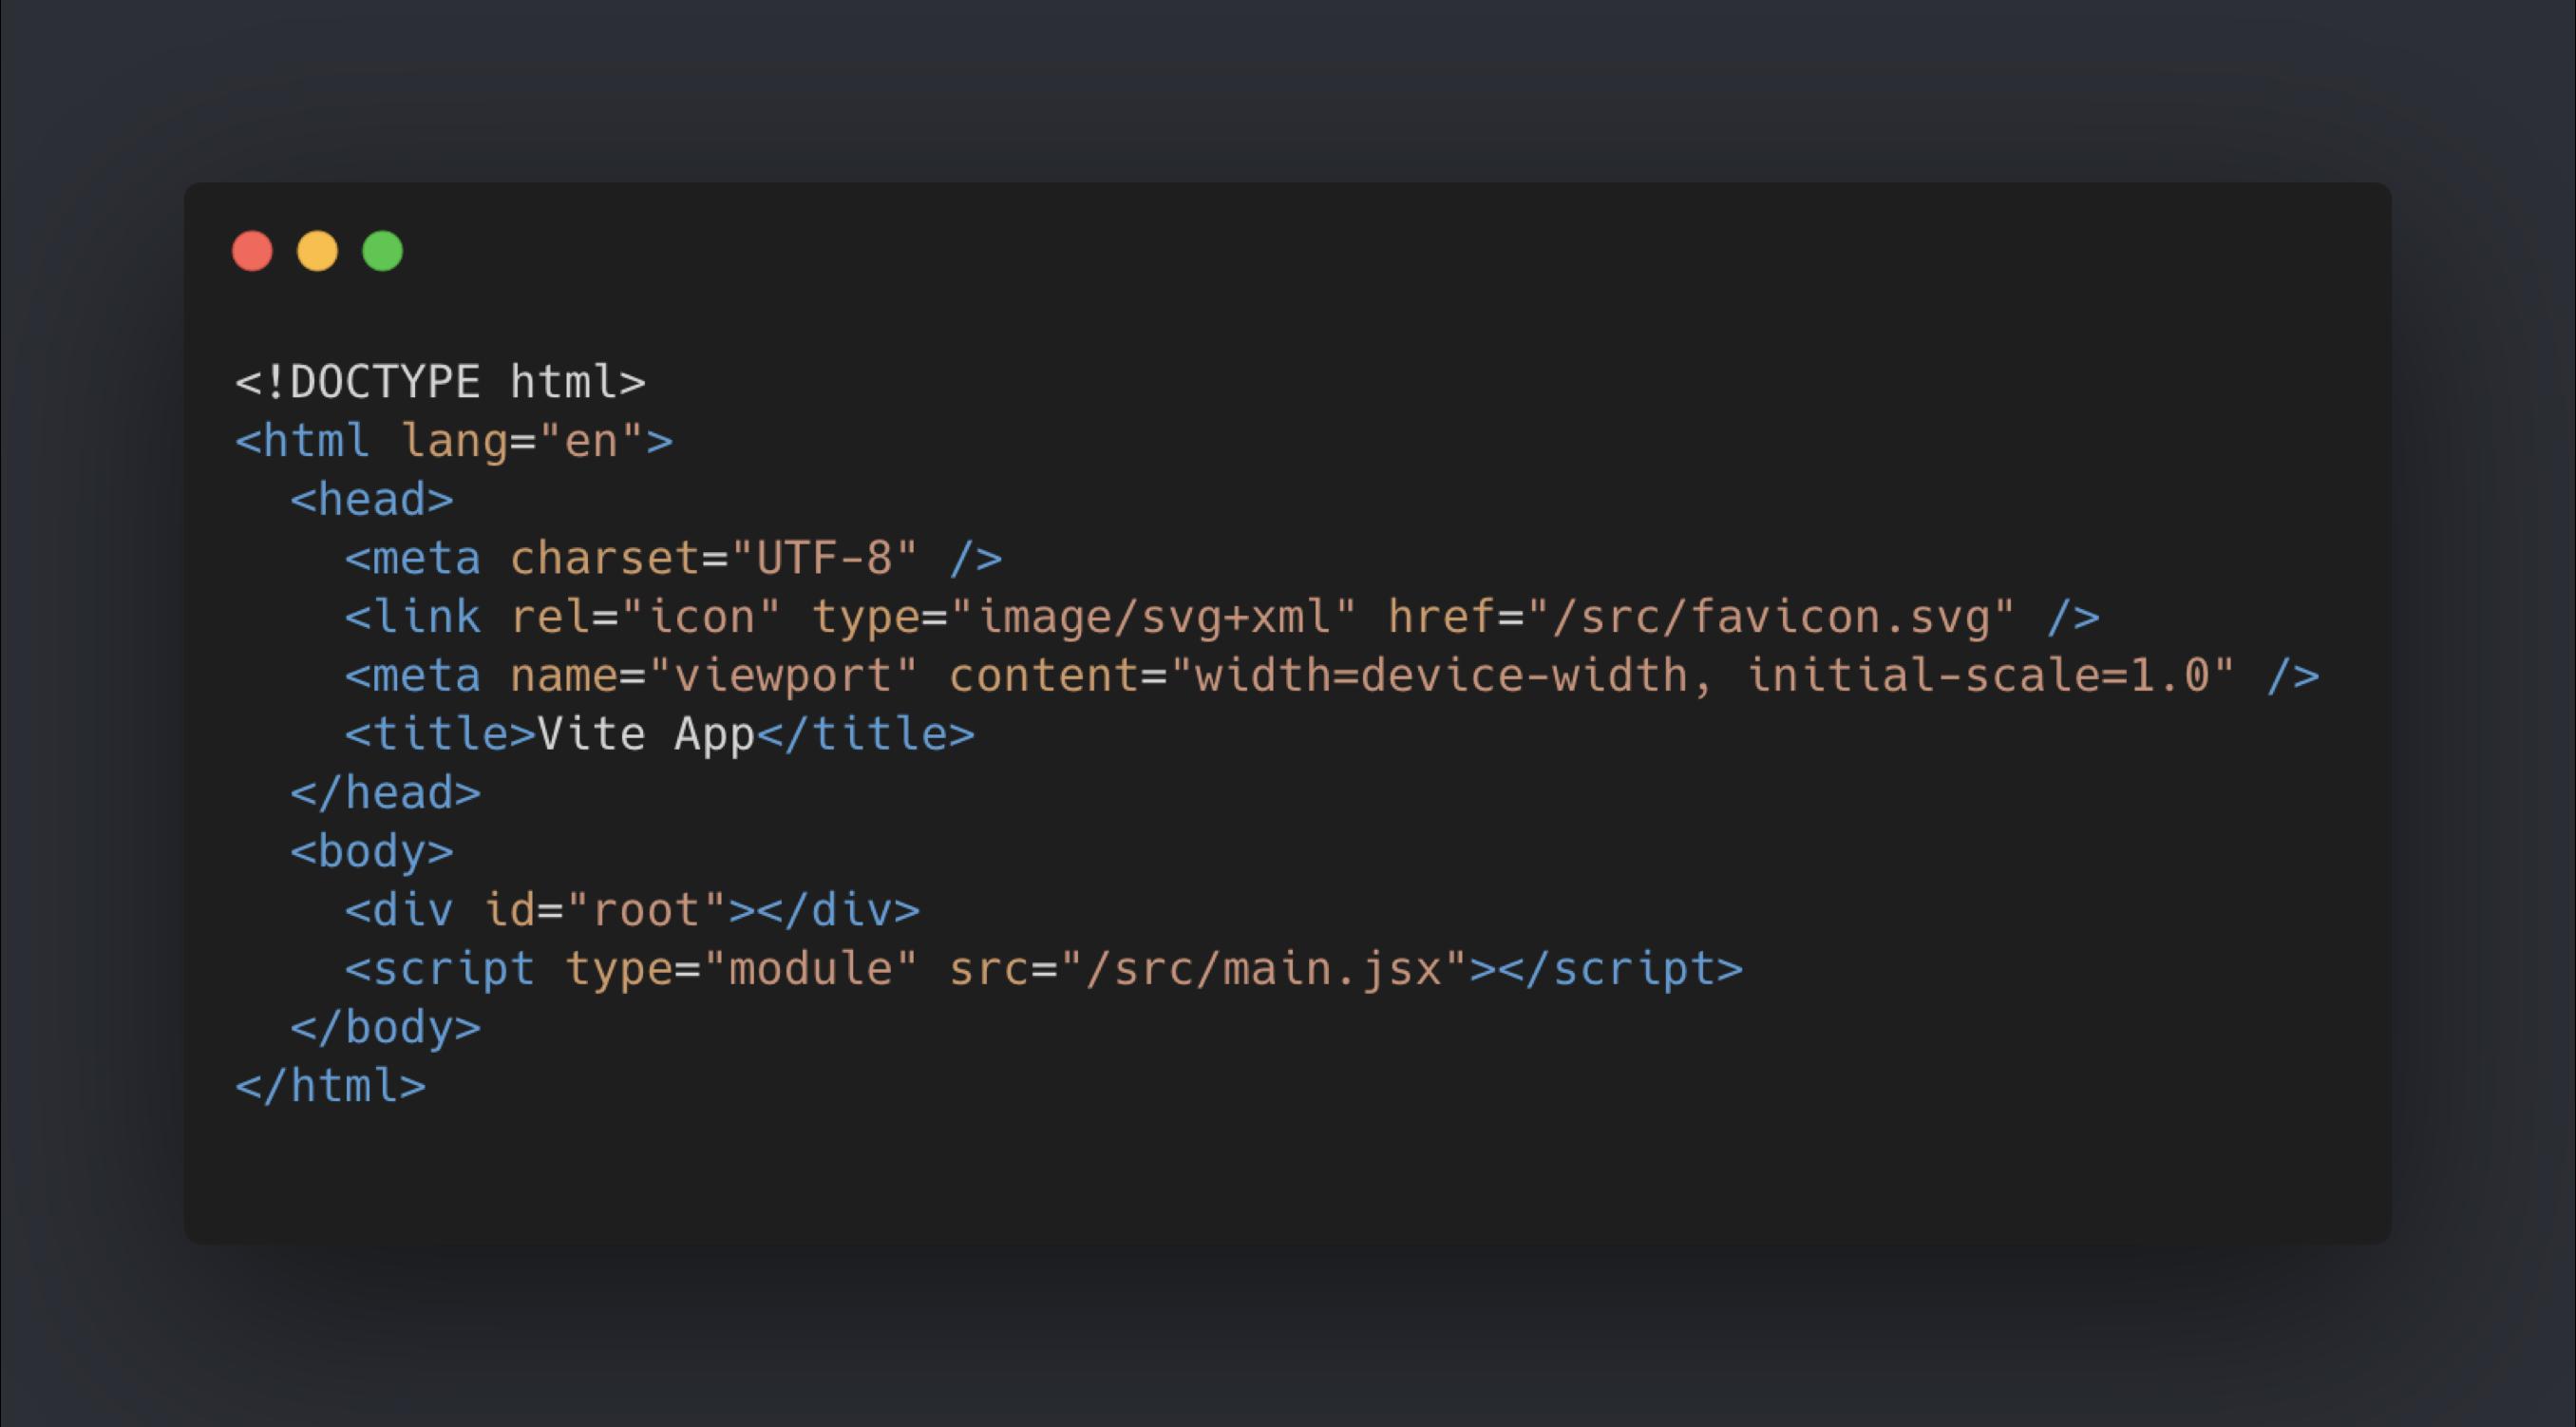 Demo HTML Code